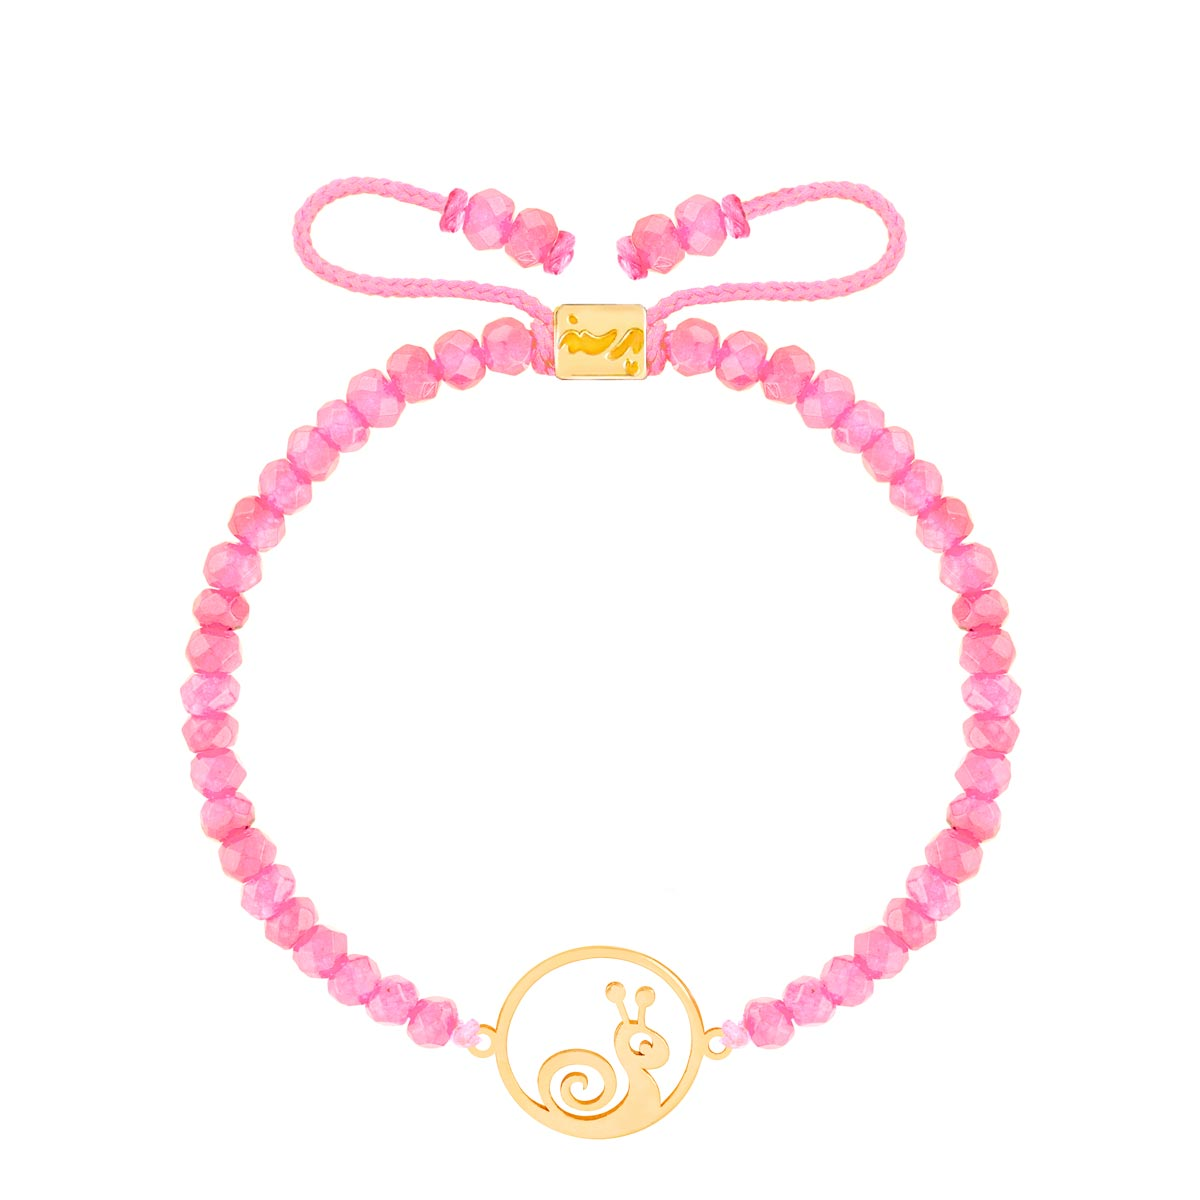 دستبند طلا بچه گانه سنگی حلزون و دایره